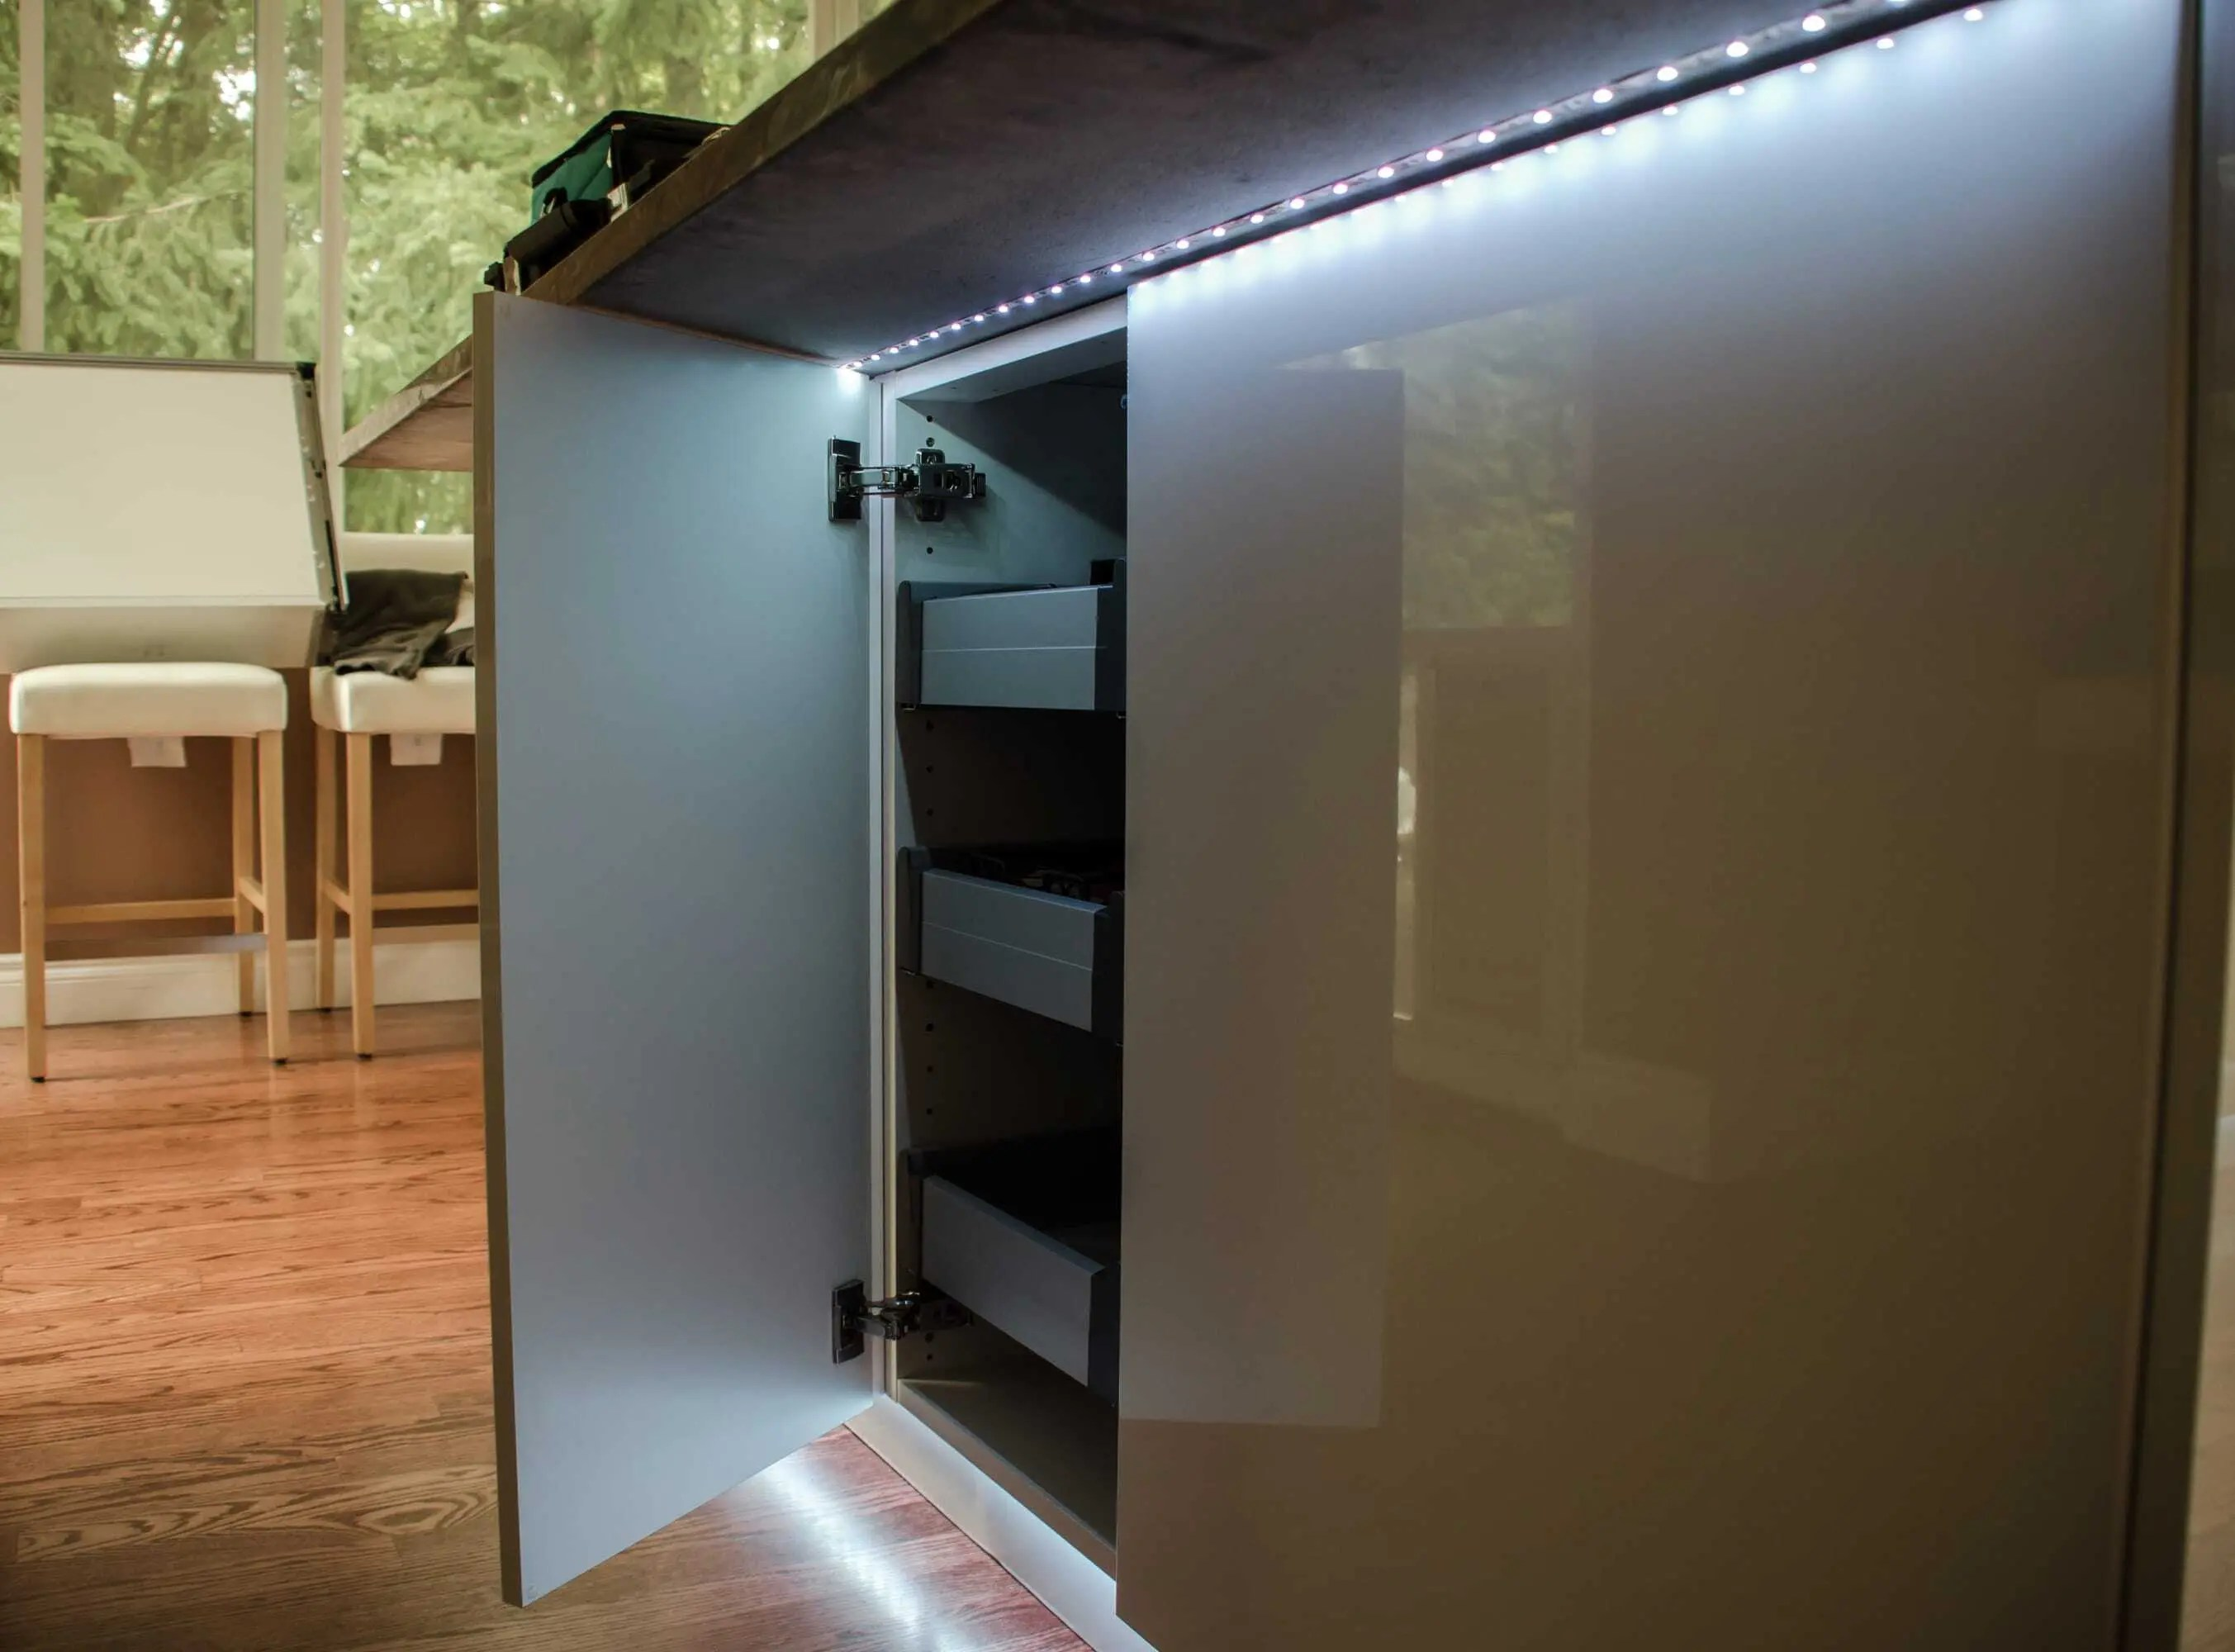 ikea hacks and other fun stuff led kitchen light LED Kitchen lighting under counter